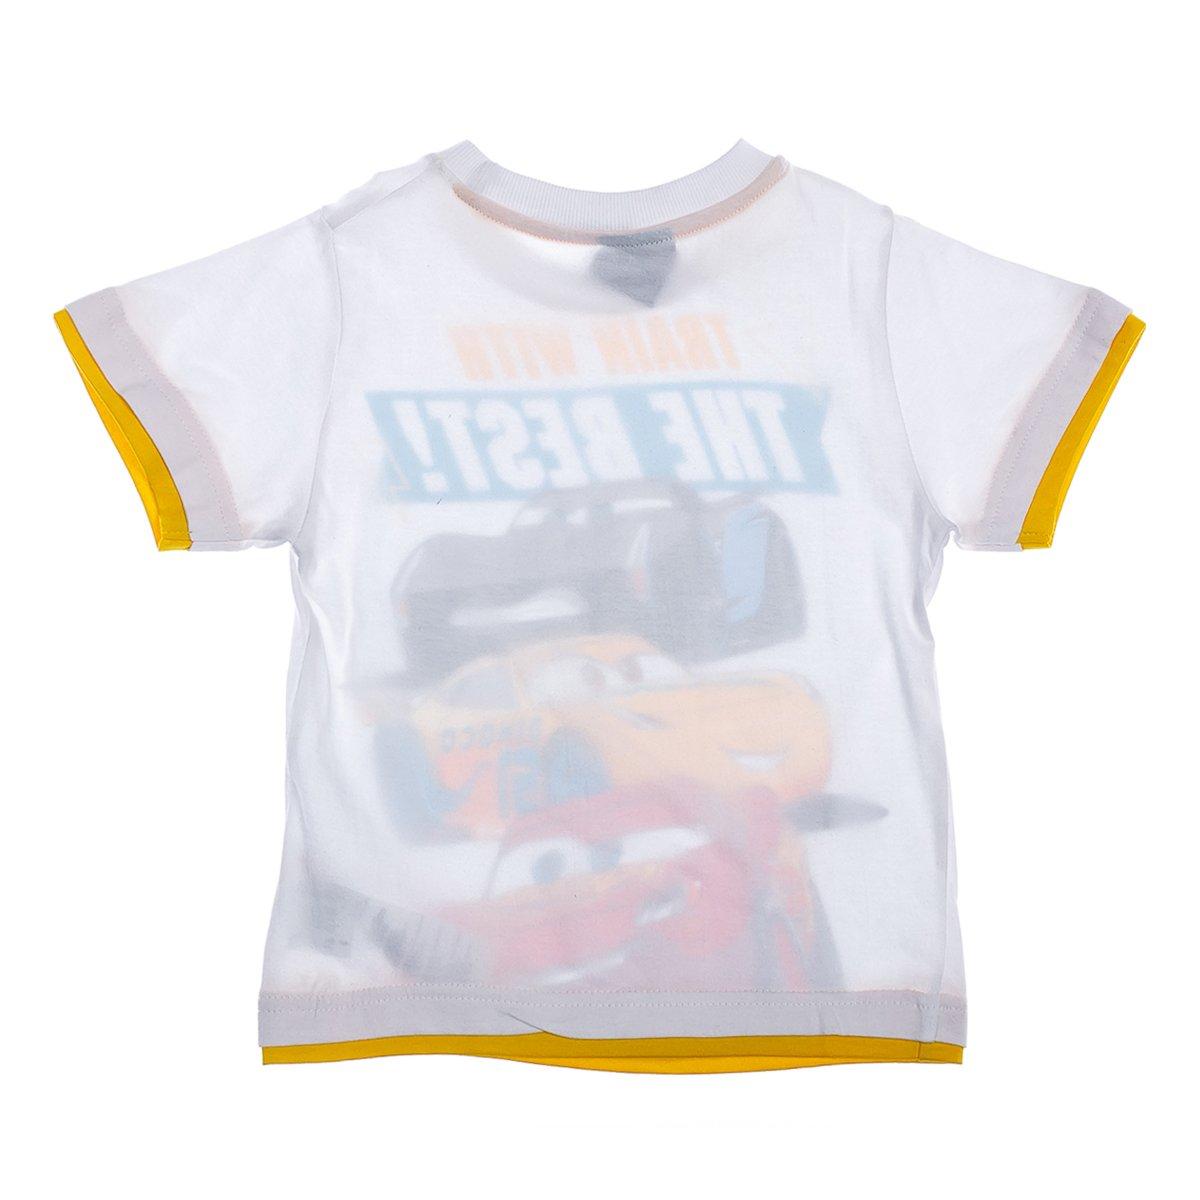 Купить Футболки, майки, топы, туники, Футболка E Plus M Cars The Best White, р. 128 DISC52026412 ТМ: E Plus M, белый